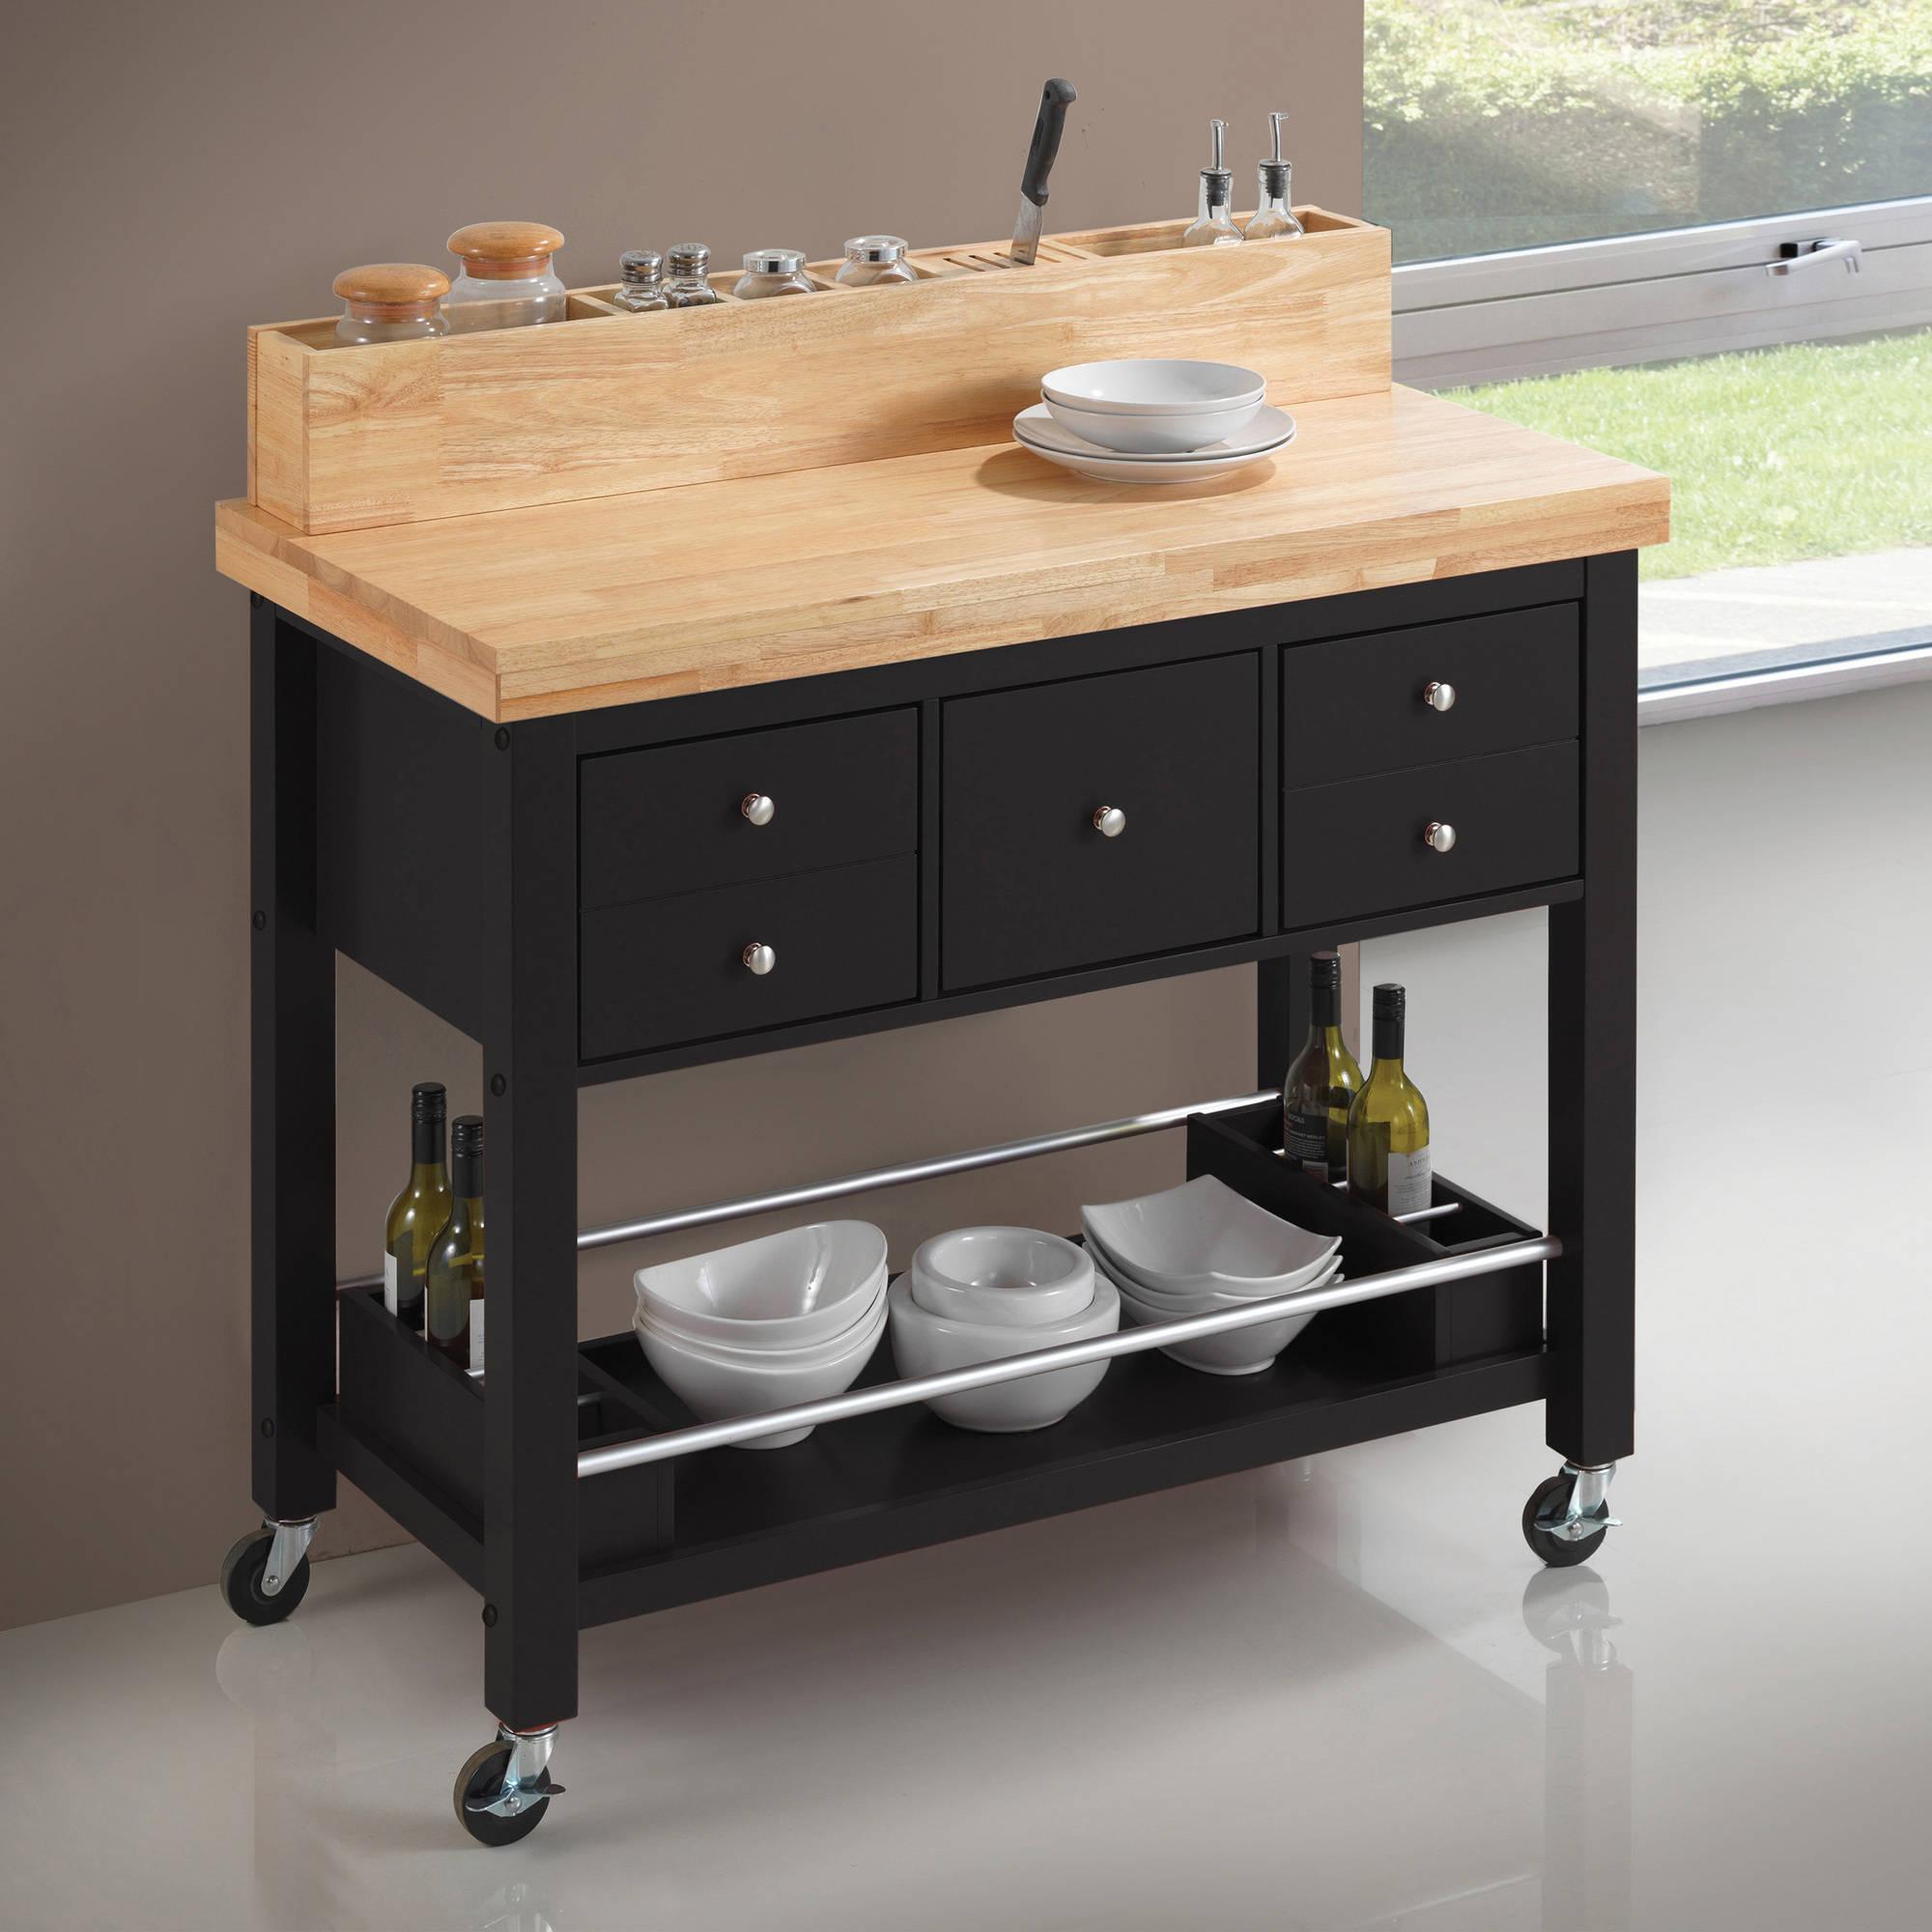 Coaster Furniture Kitchen Cart, Natural and Black